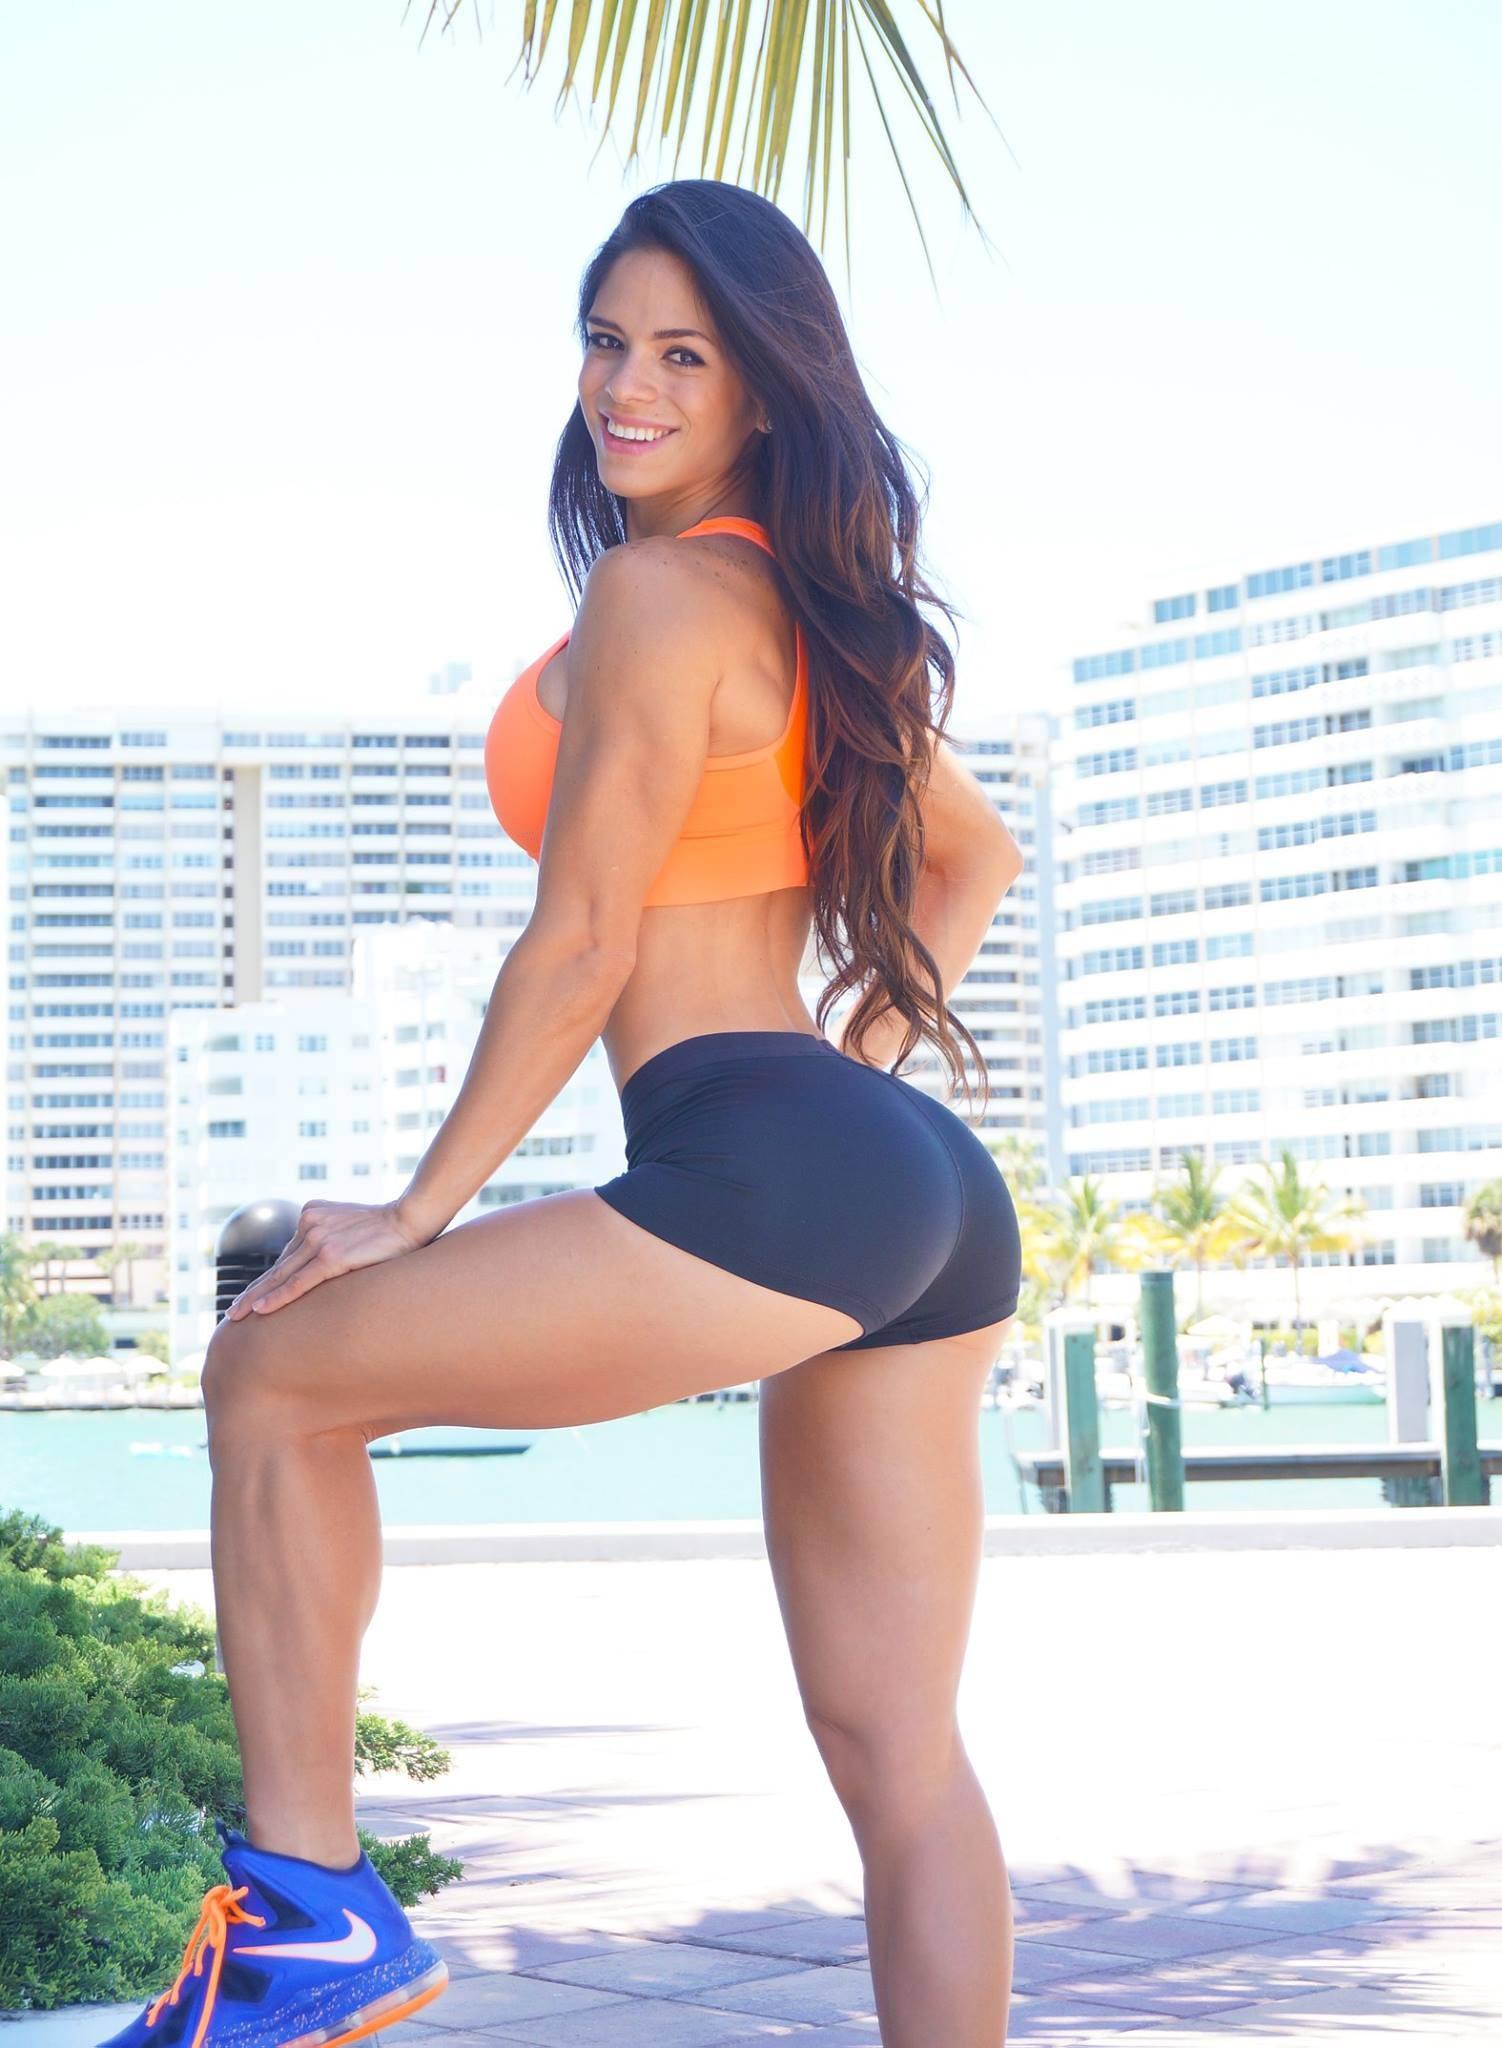 People 1502x2048 Nike sports bra Michelle Lewin booty shorts yoga pants short shorts women outdoors ass smiling sport bras long hair